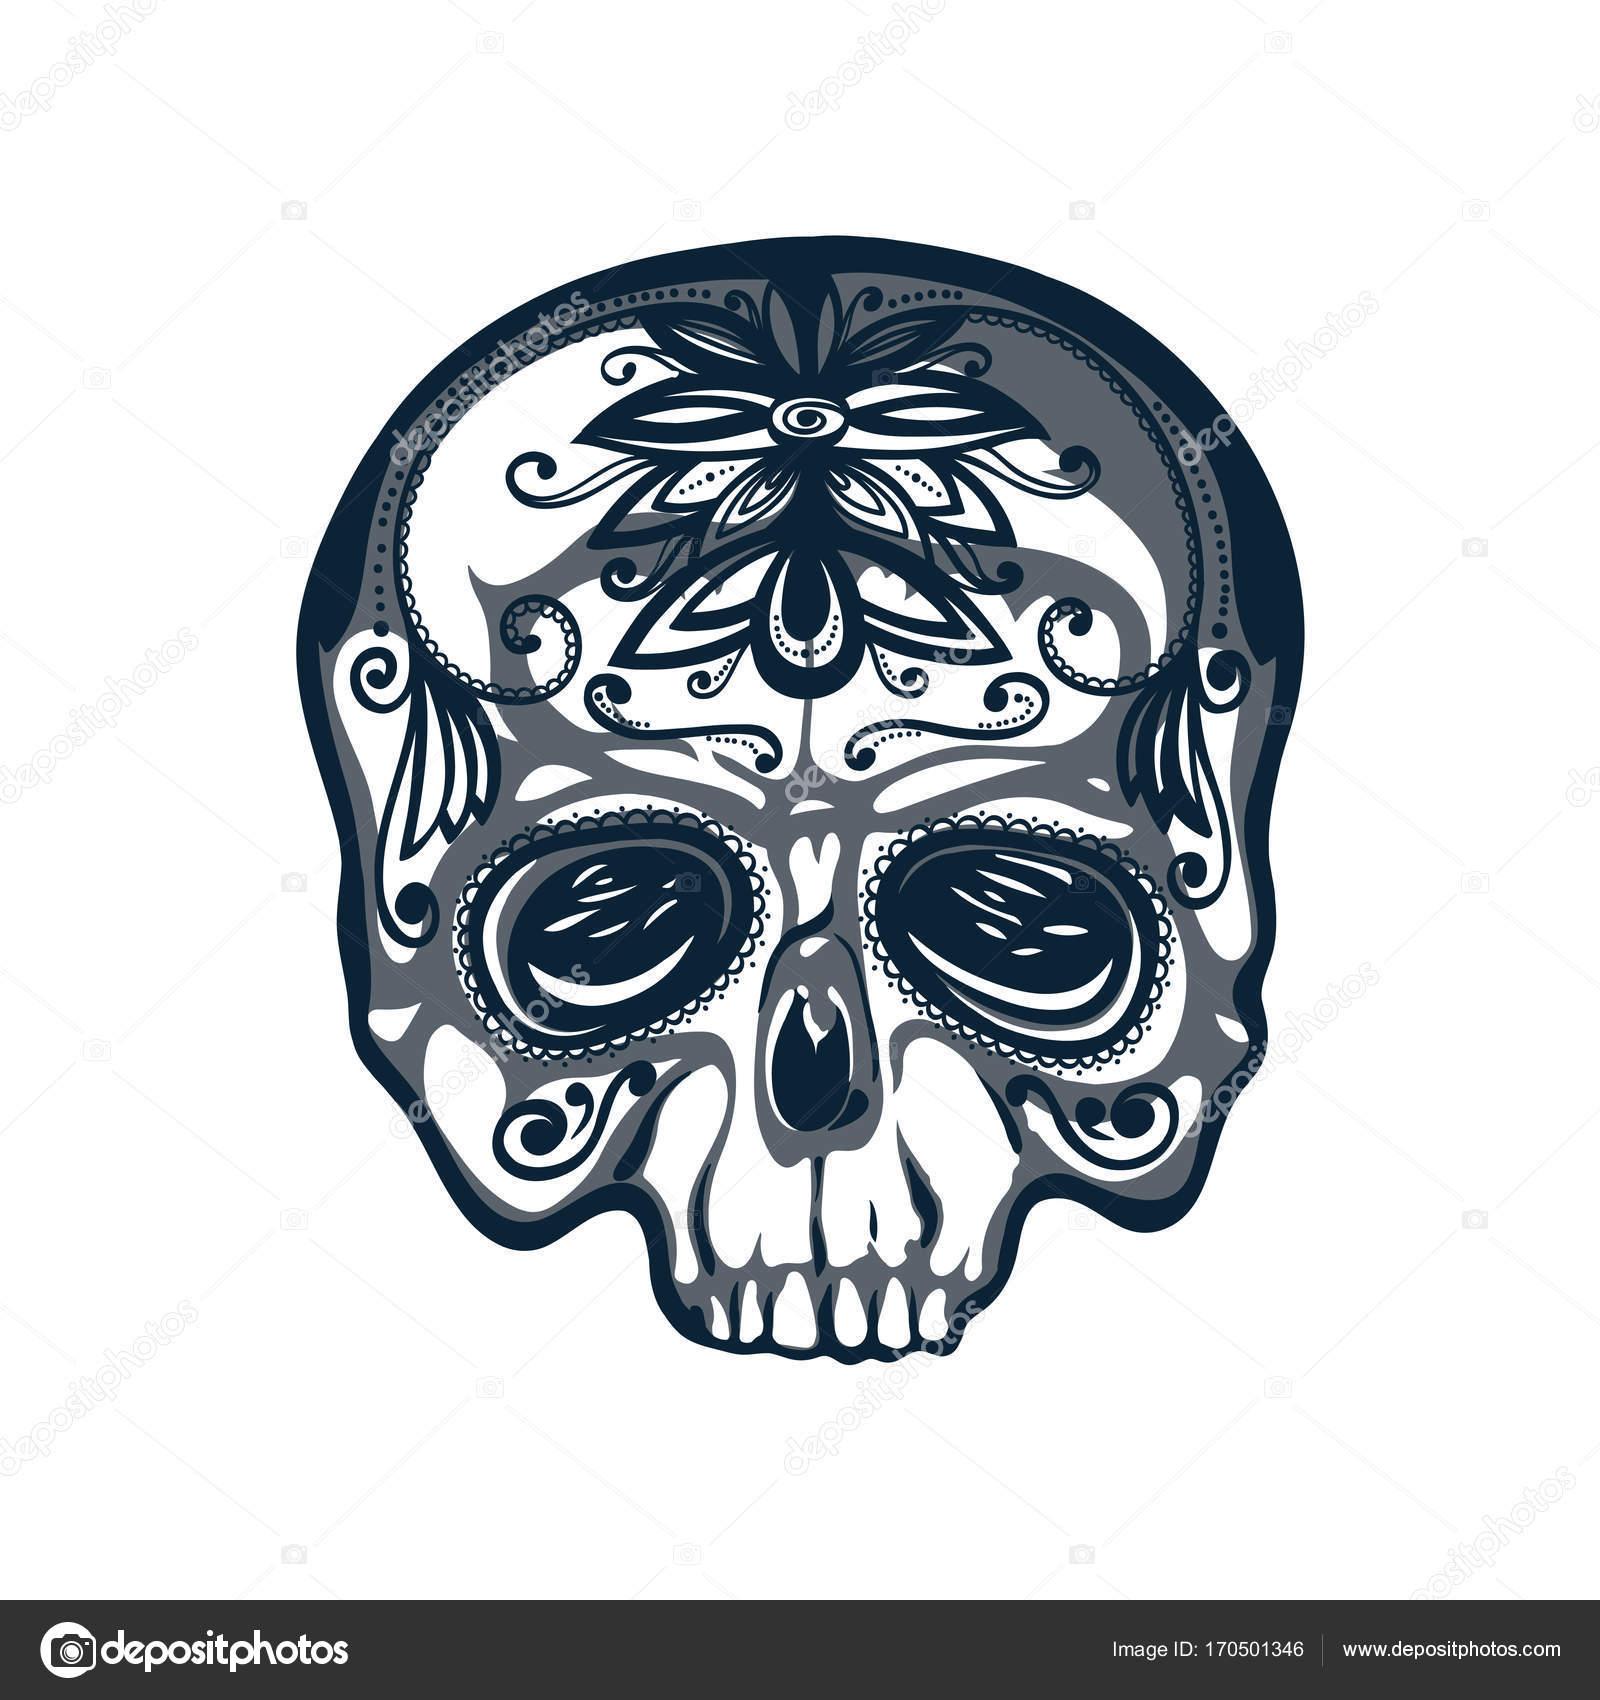 1600x1700 Dia De Los Muertos Card. Mexican Day Of The Dead. Skull Decorated